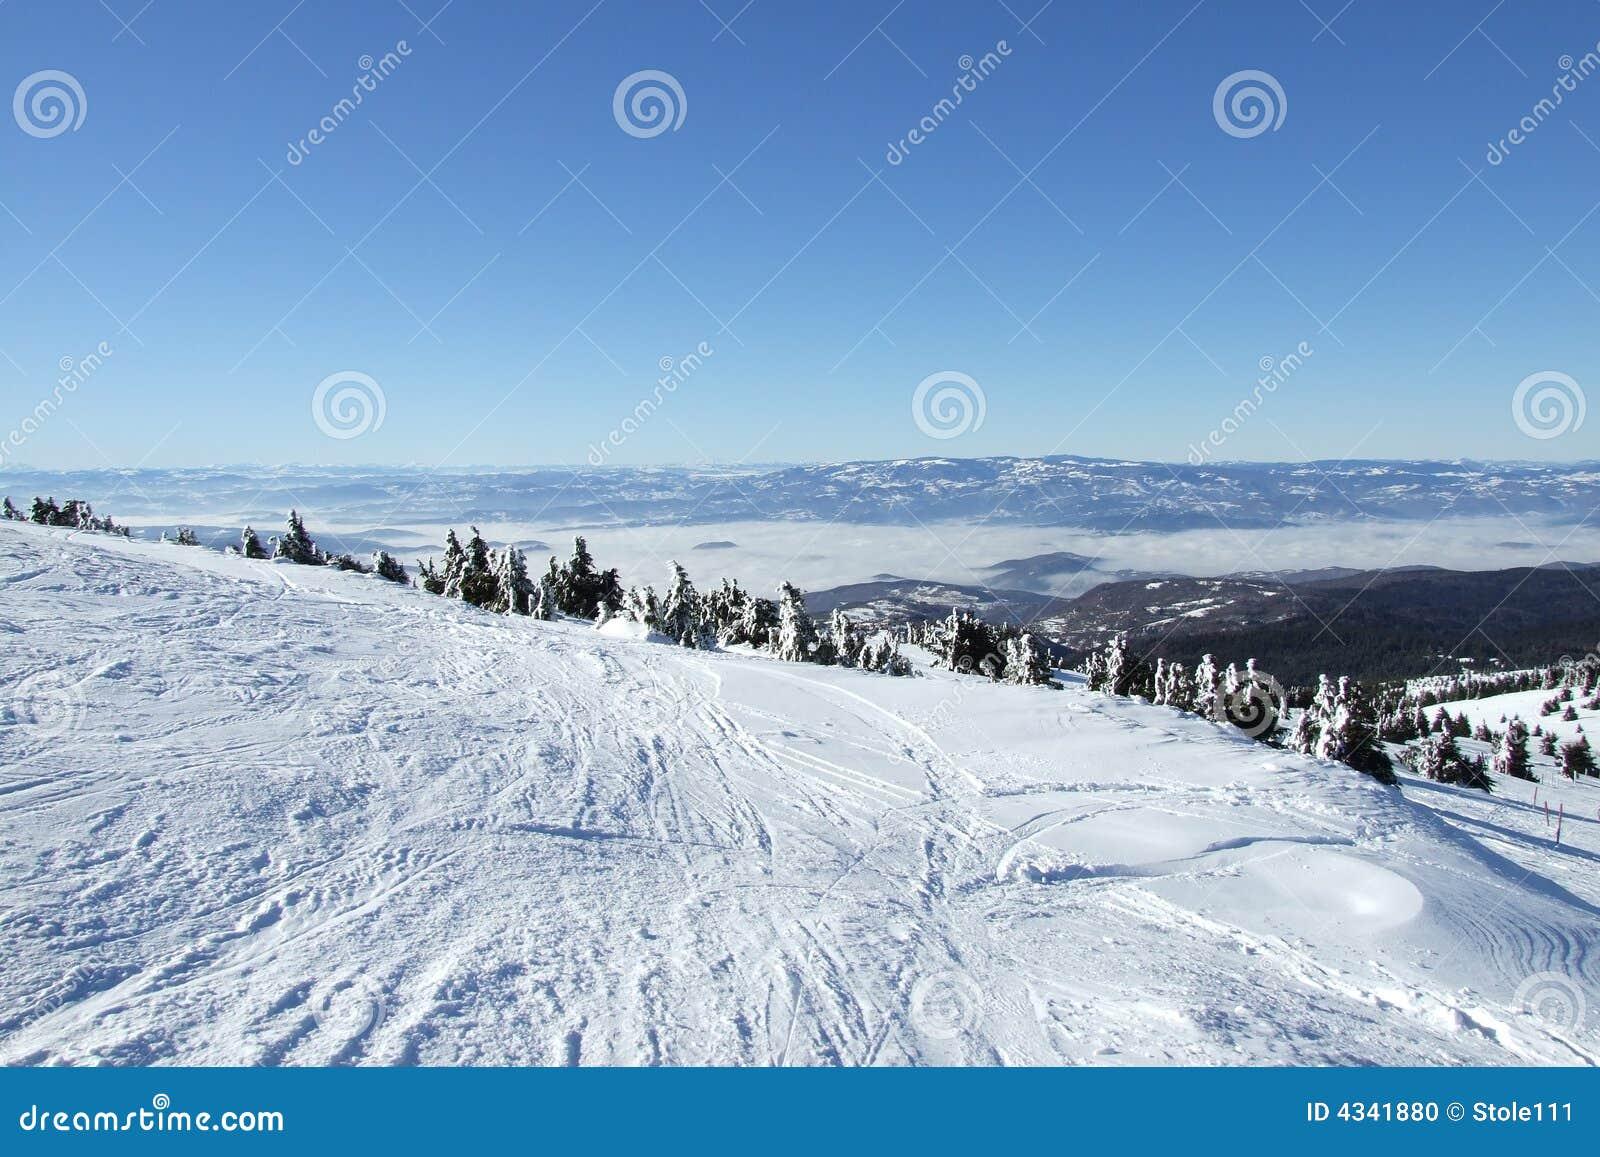 Snow winter scene on Kopaonik